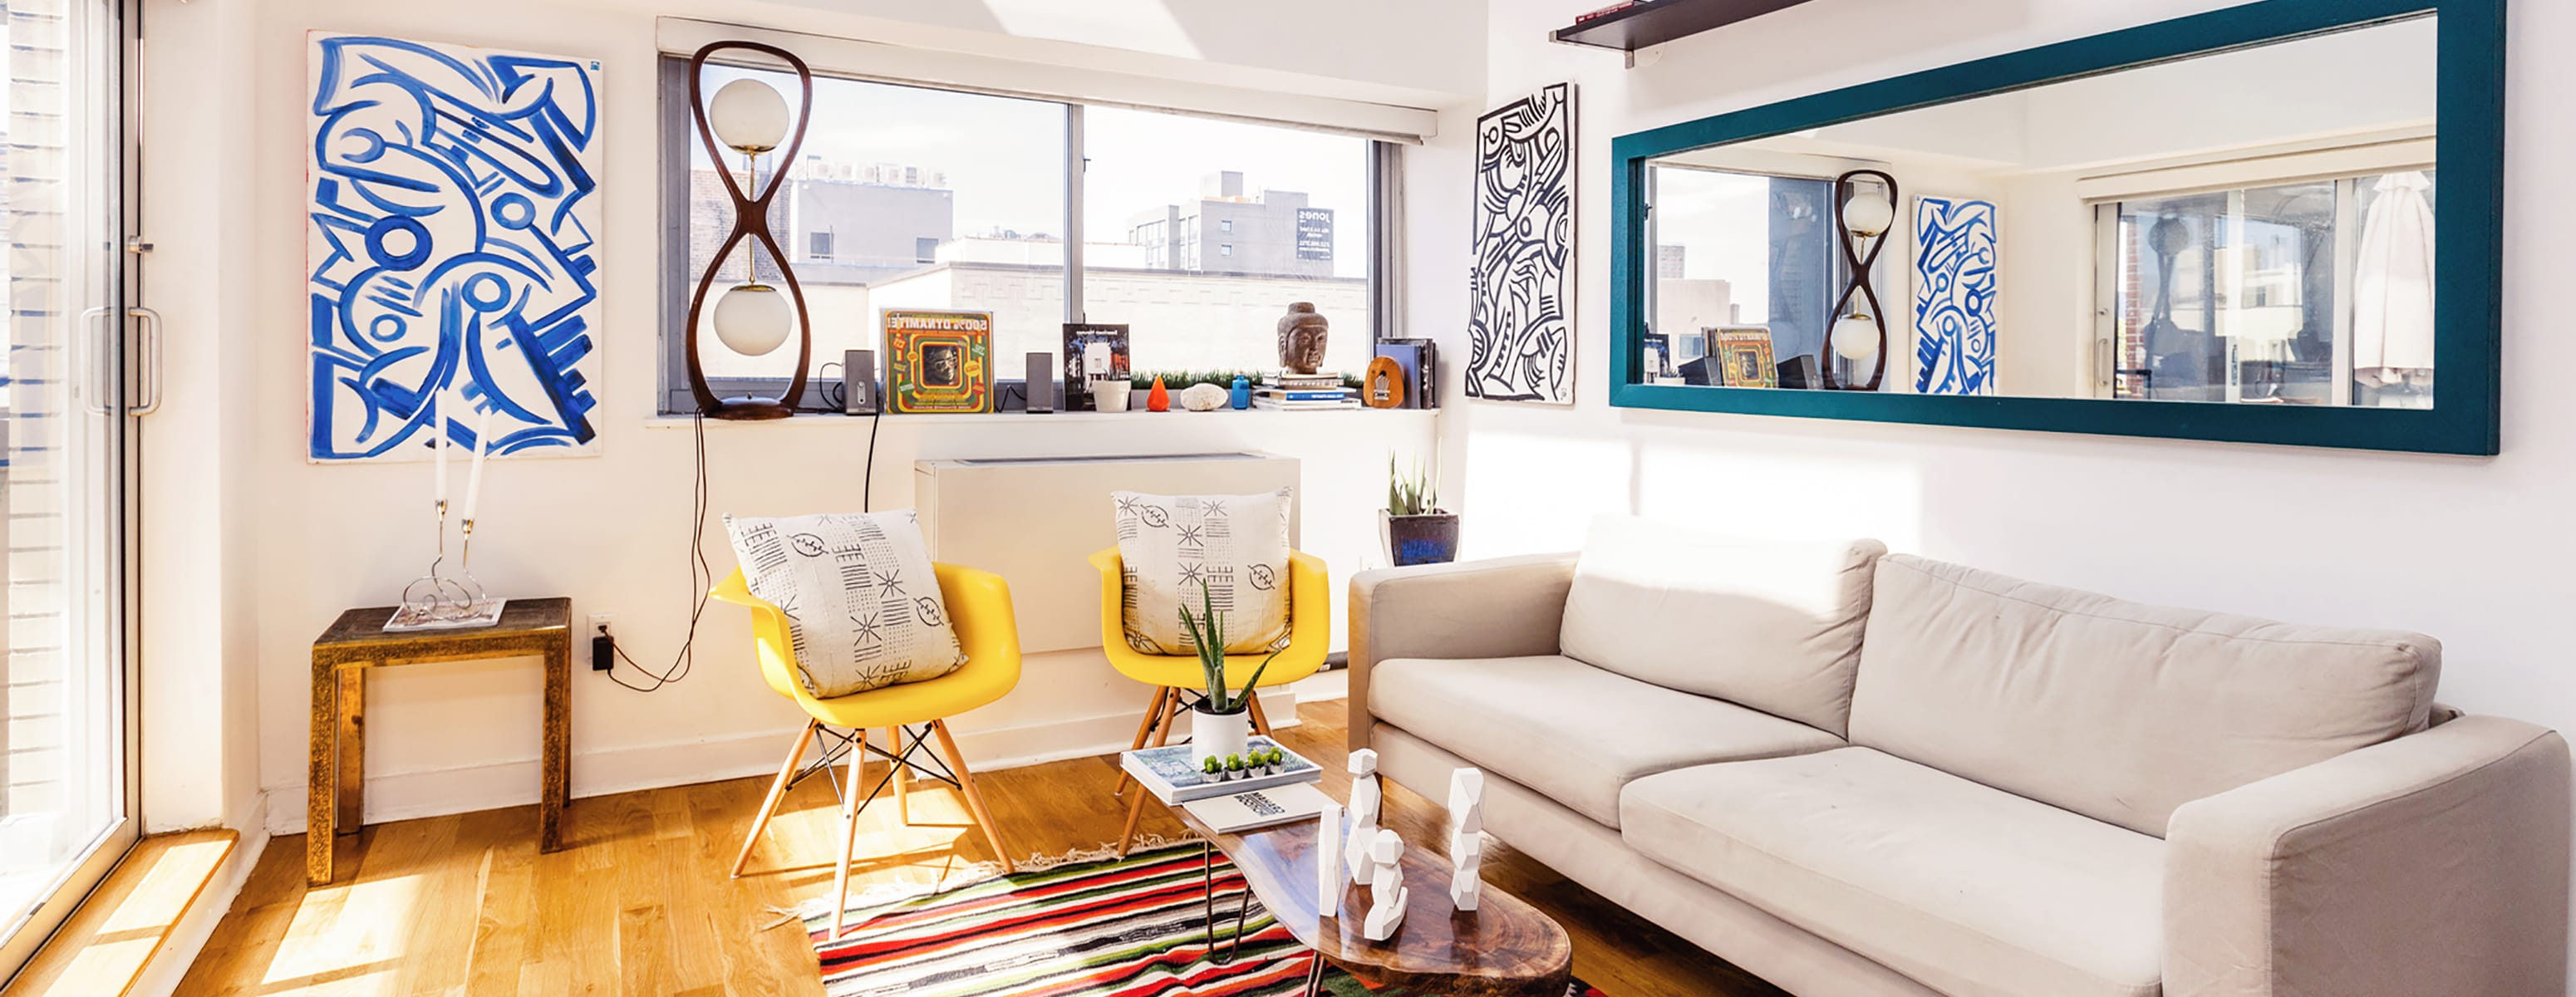 arlington 2017 top 20 arlington vacation rentals vacation homes